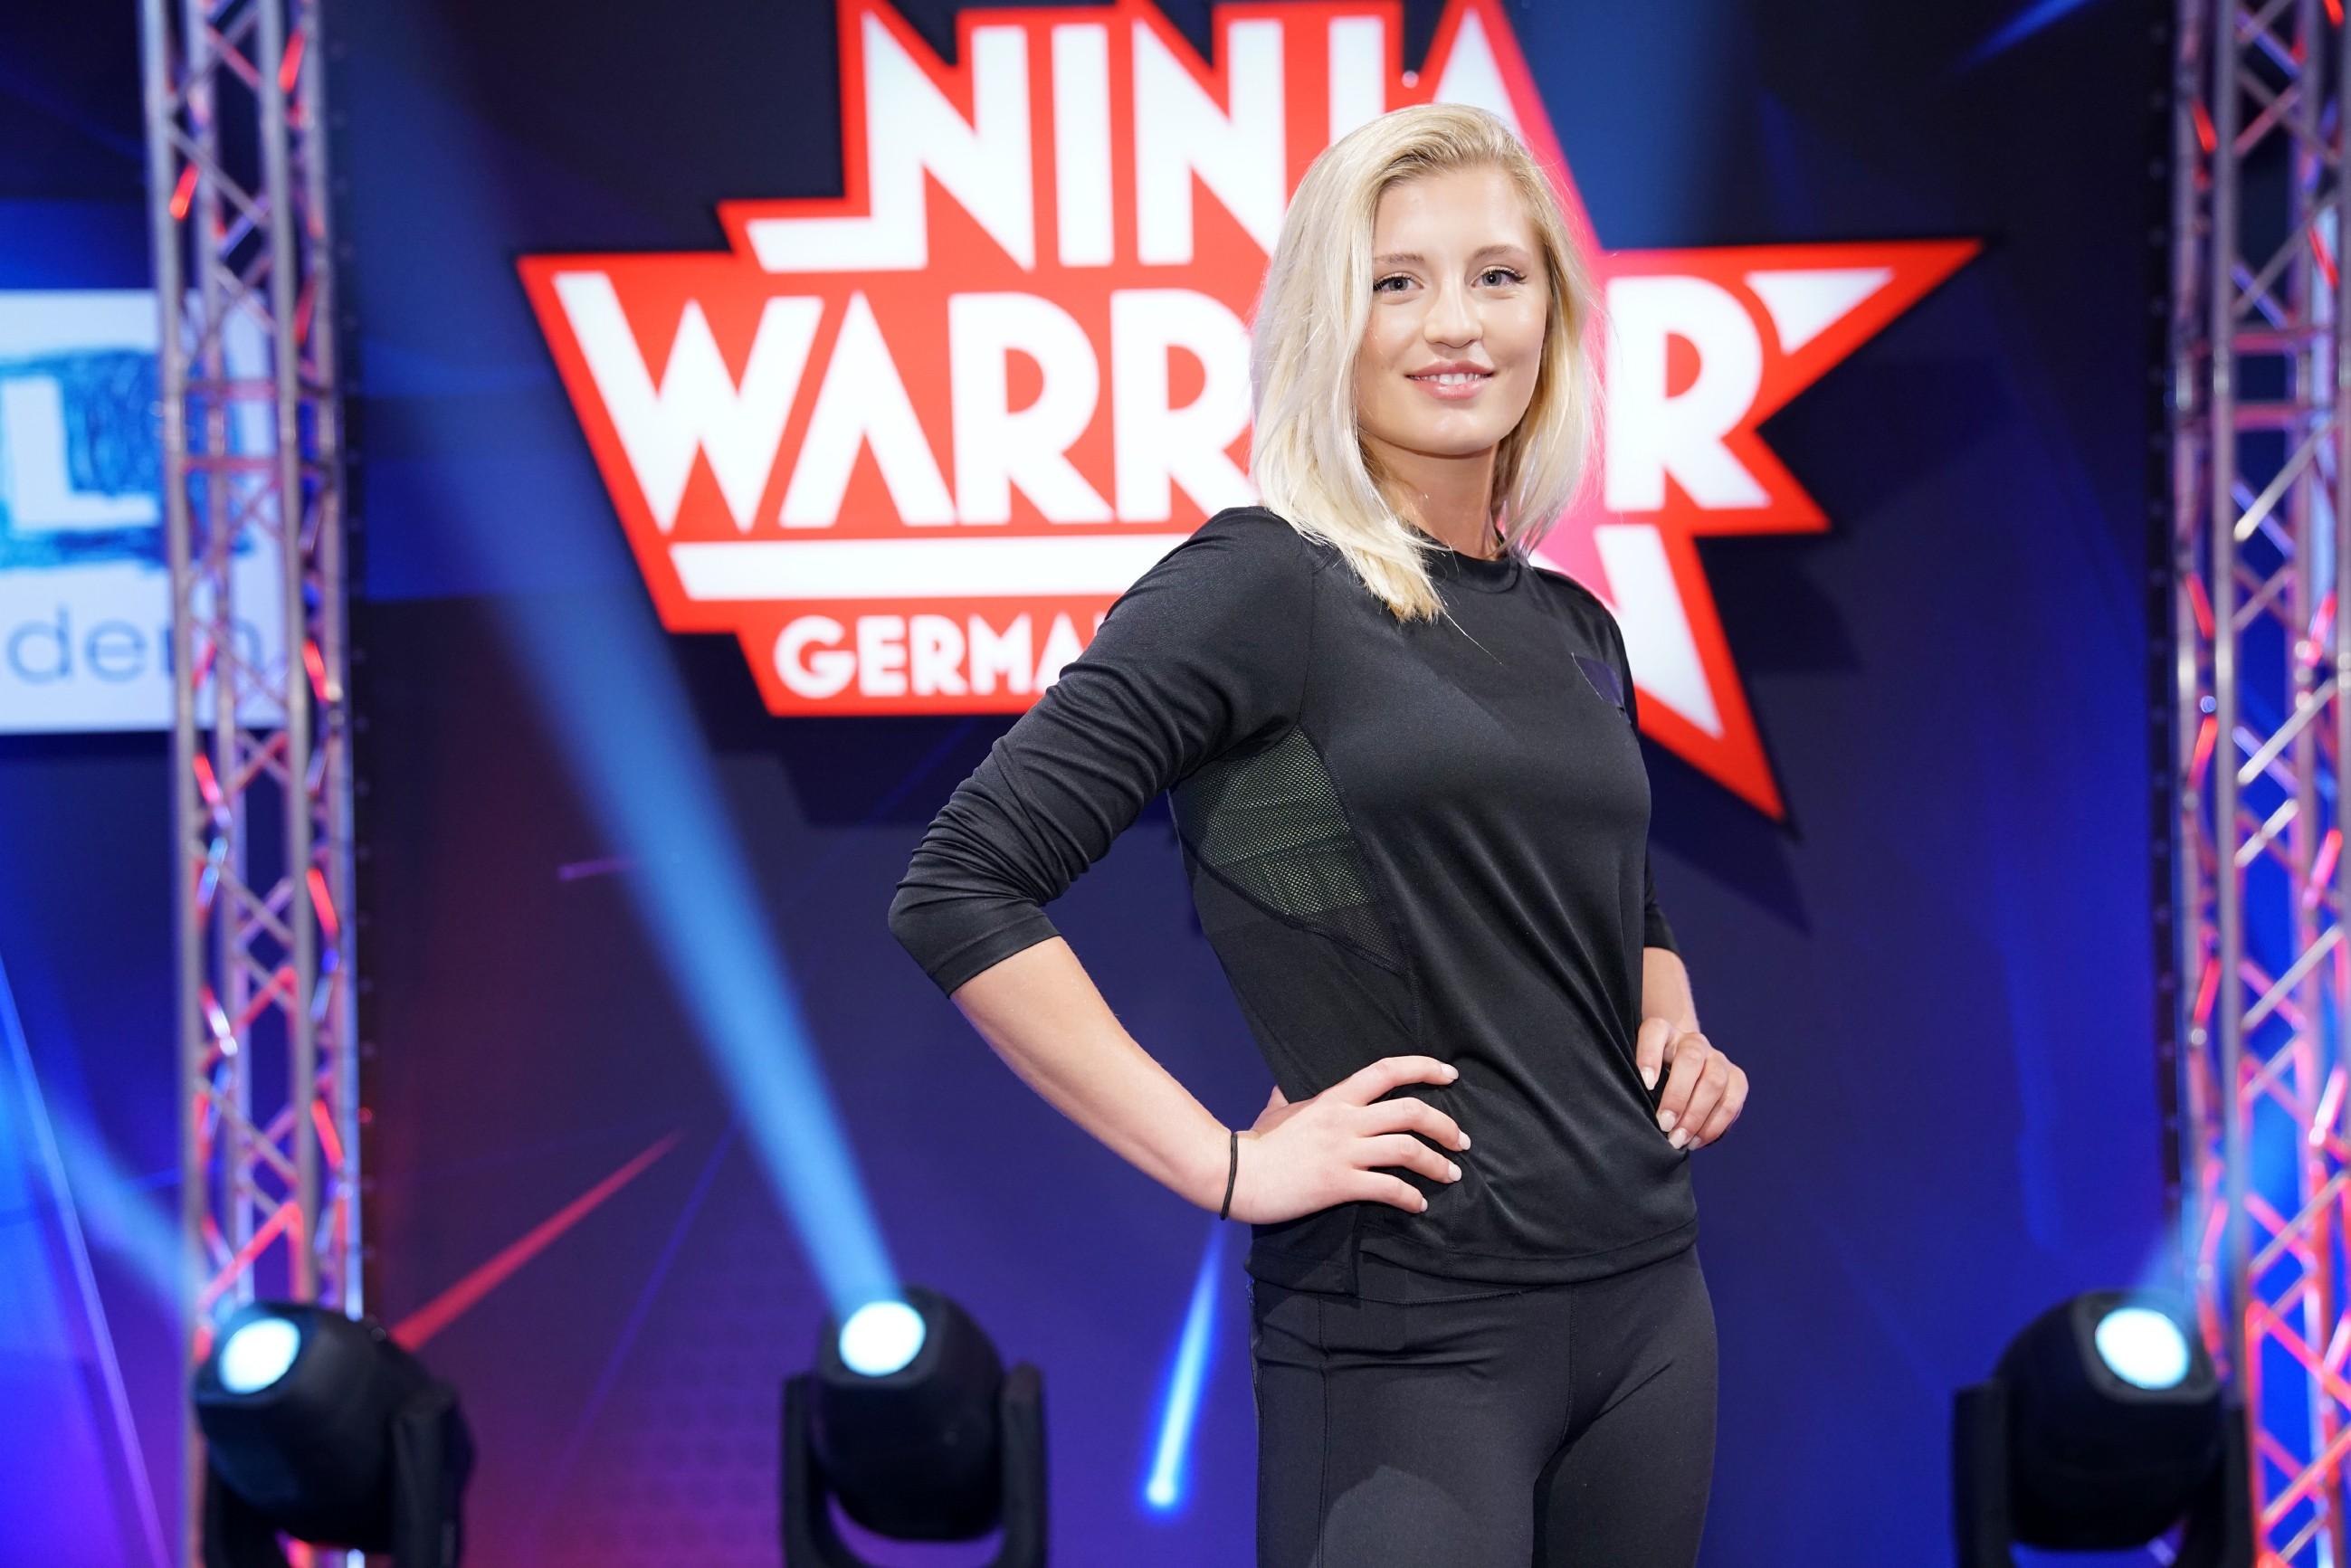 ninja warrior germany promi special 2018 luna schweiger stars on tv